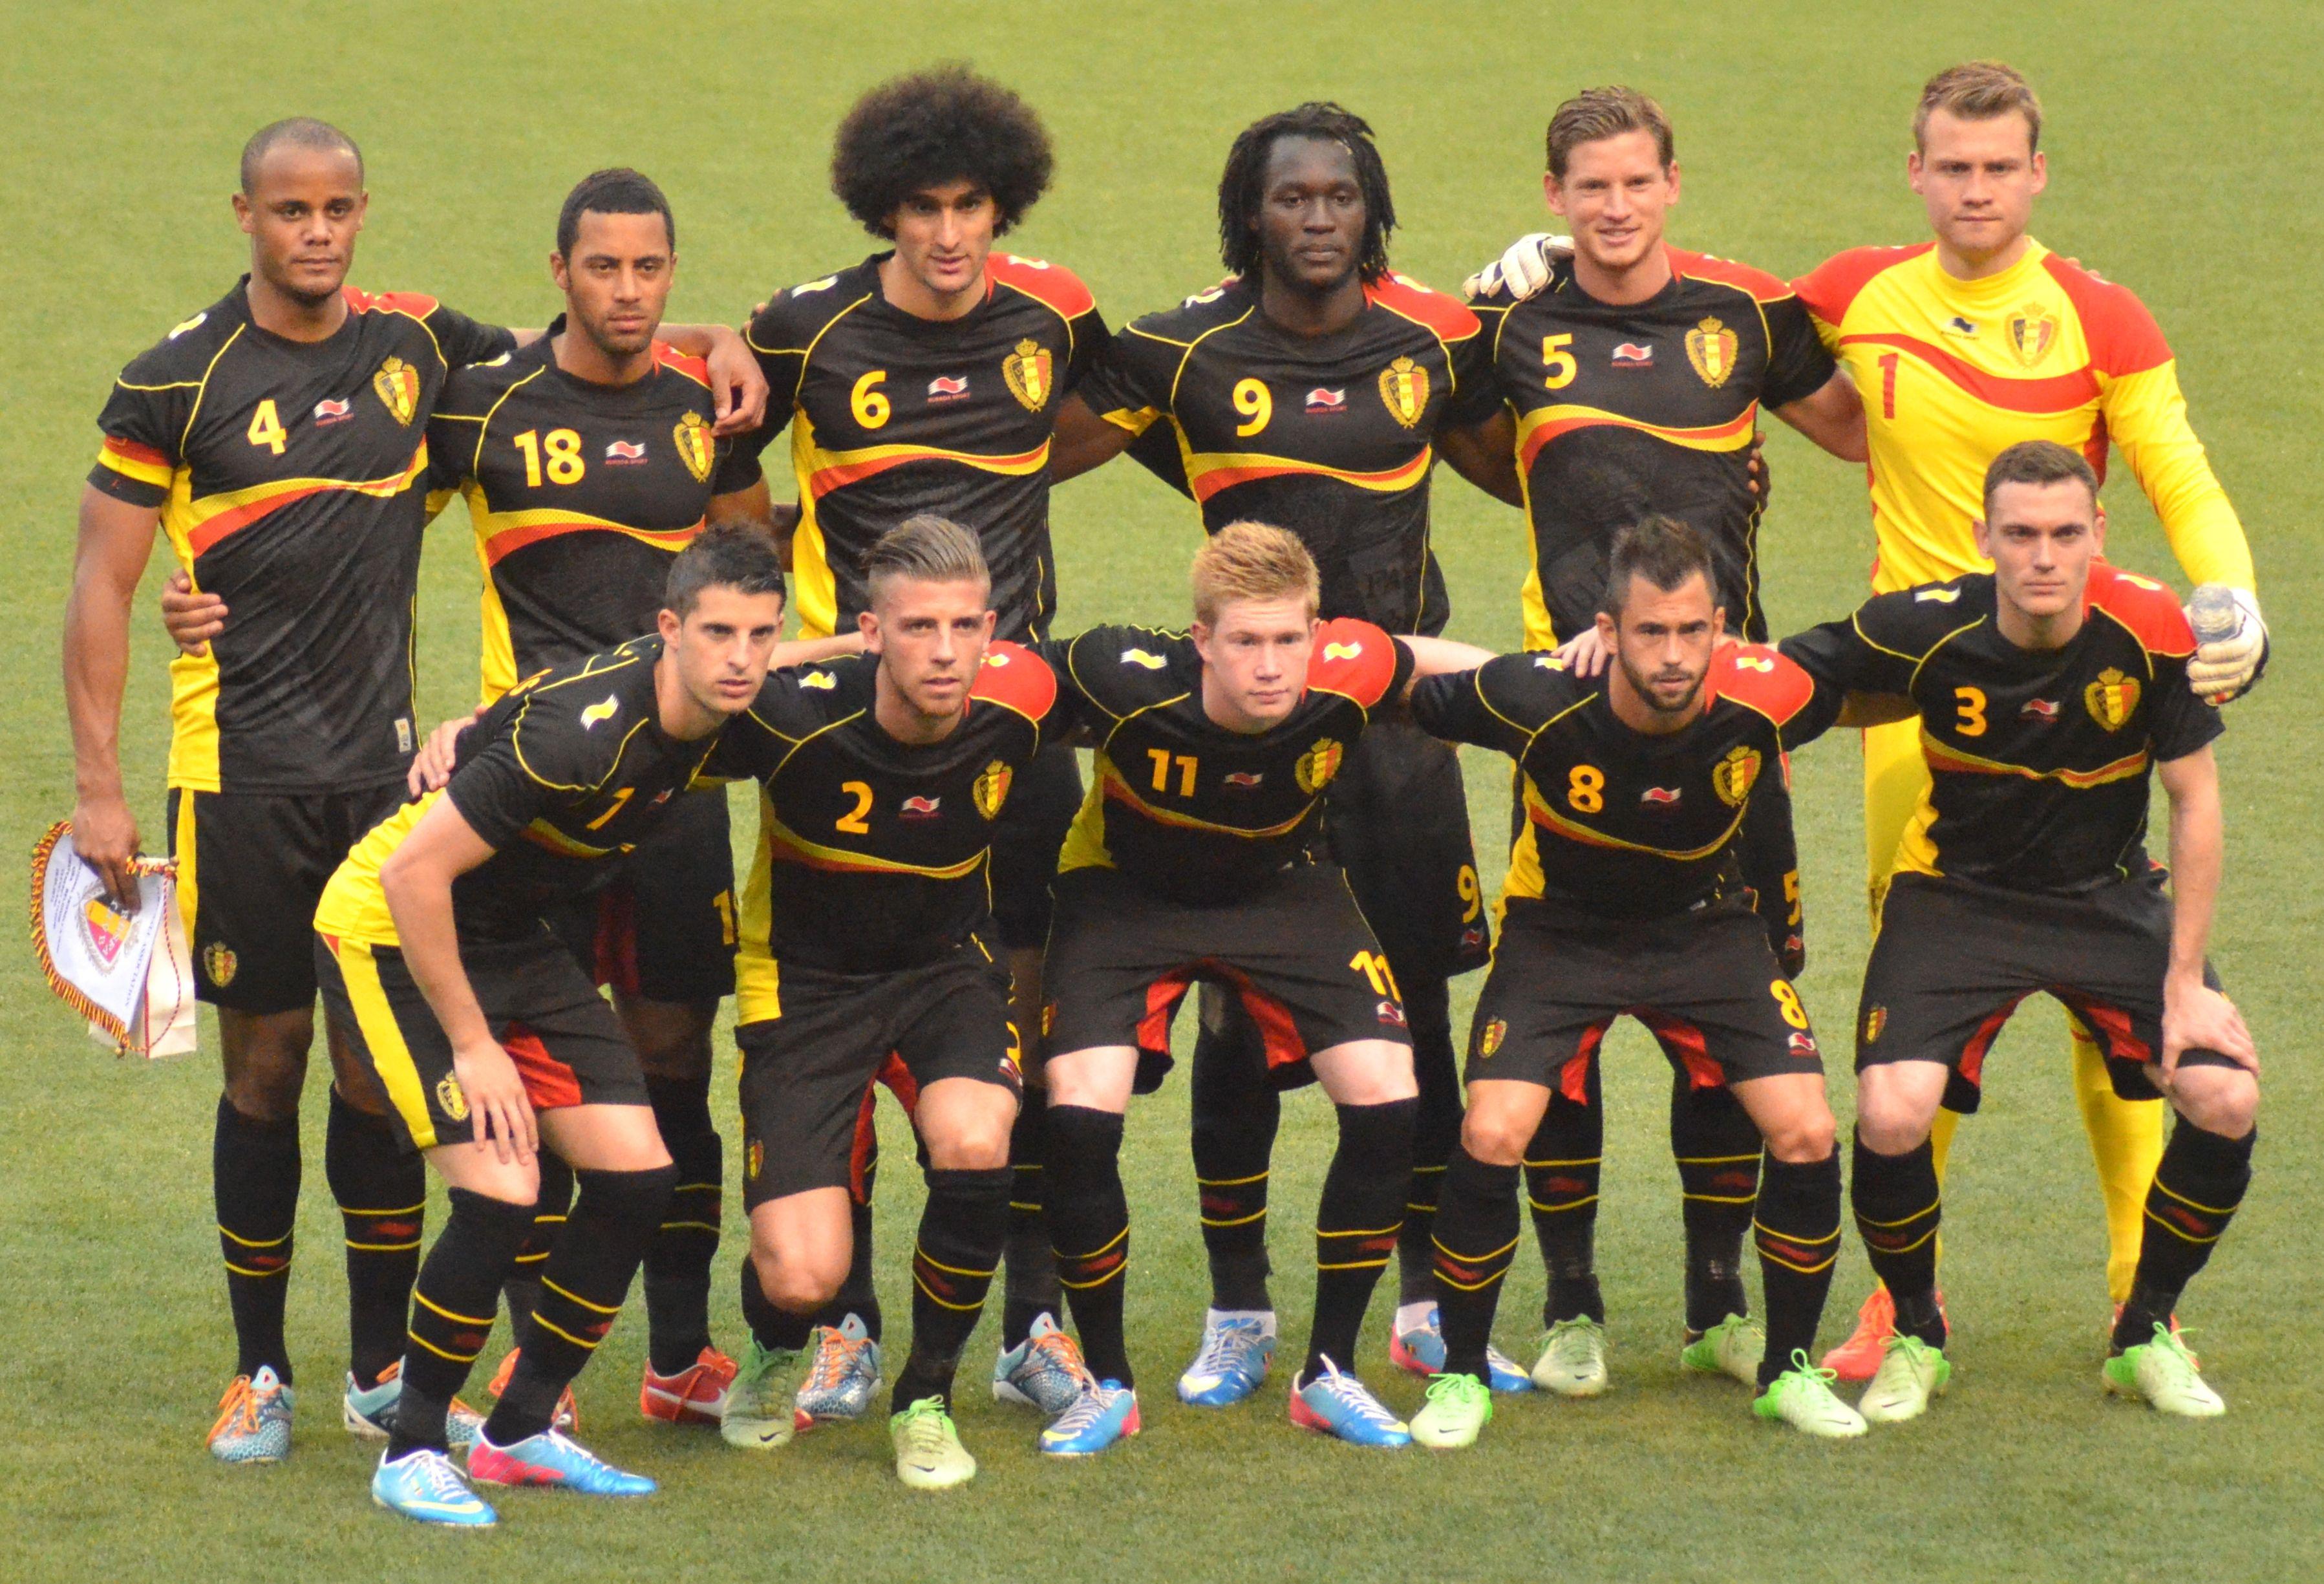 82777ea9d8b Belgium National Football Team Wallpapers - Wallpaper Cave